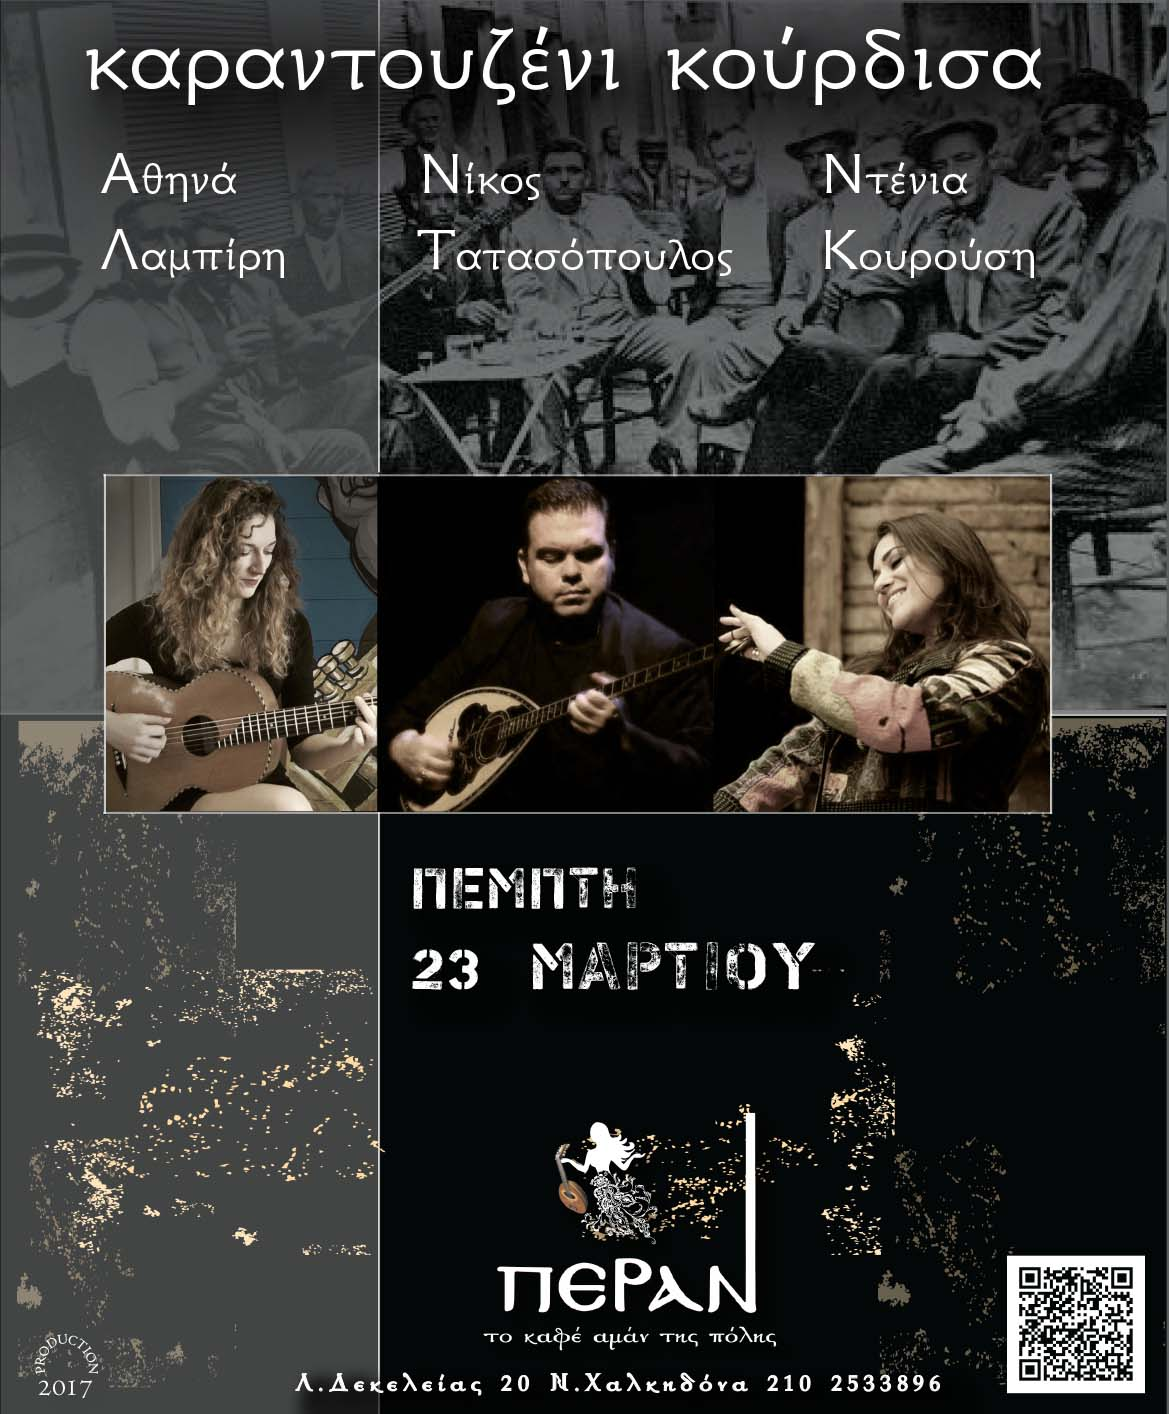 TATASOPOYLOW-KOYROYSI 23-3